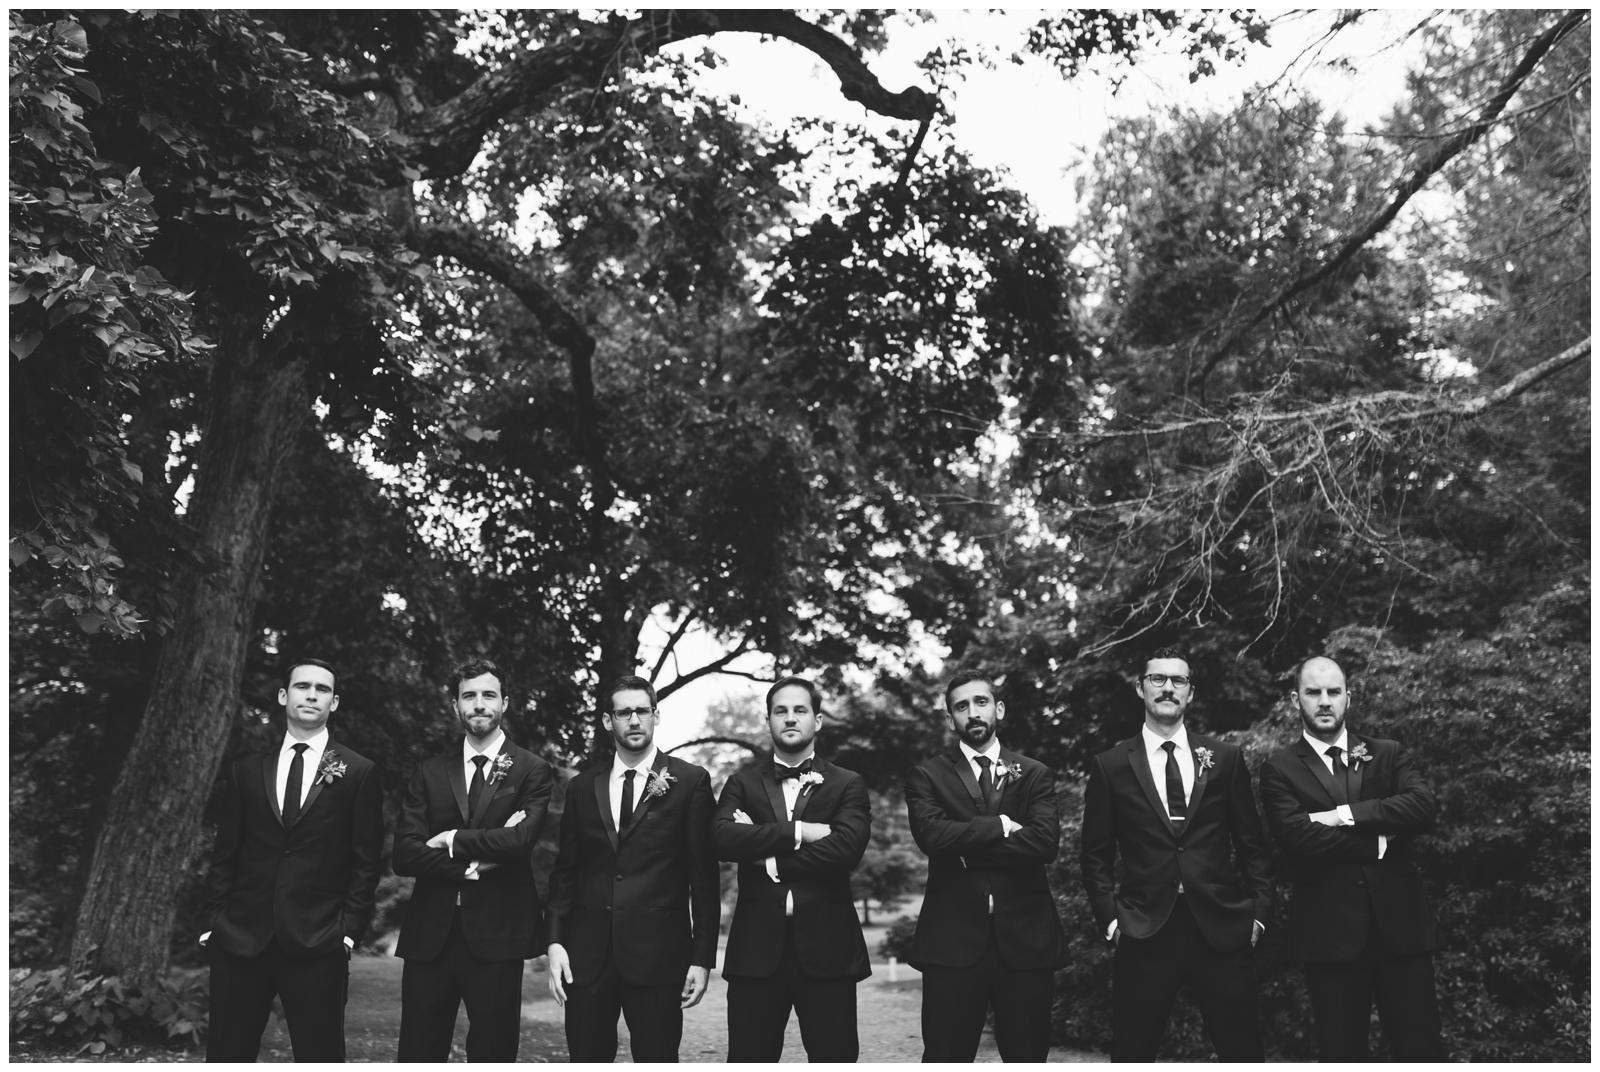 Moraine-Farm-wedding-Bailey-Q-Photo-Massachusetts-wedding-photpgrapher-040.jpg